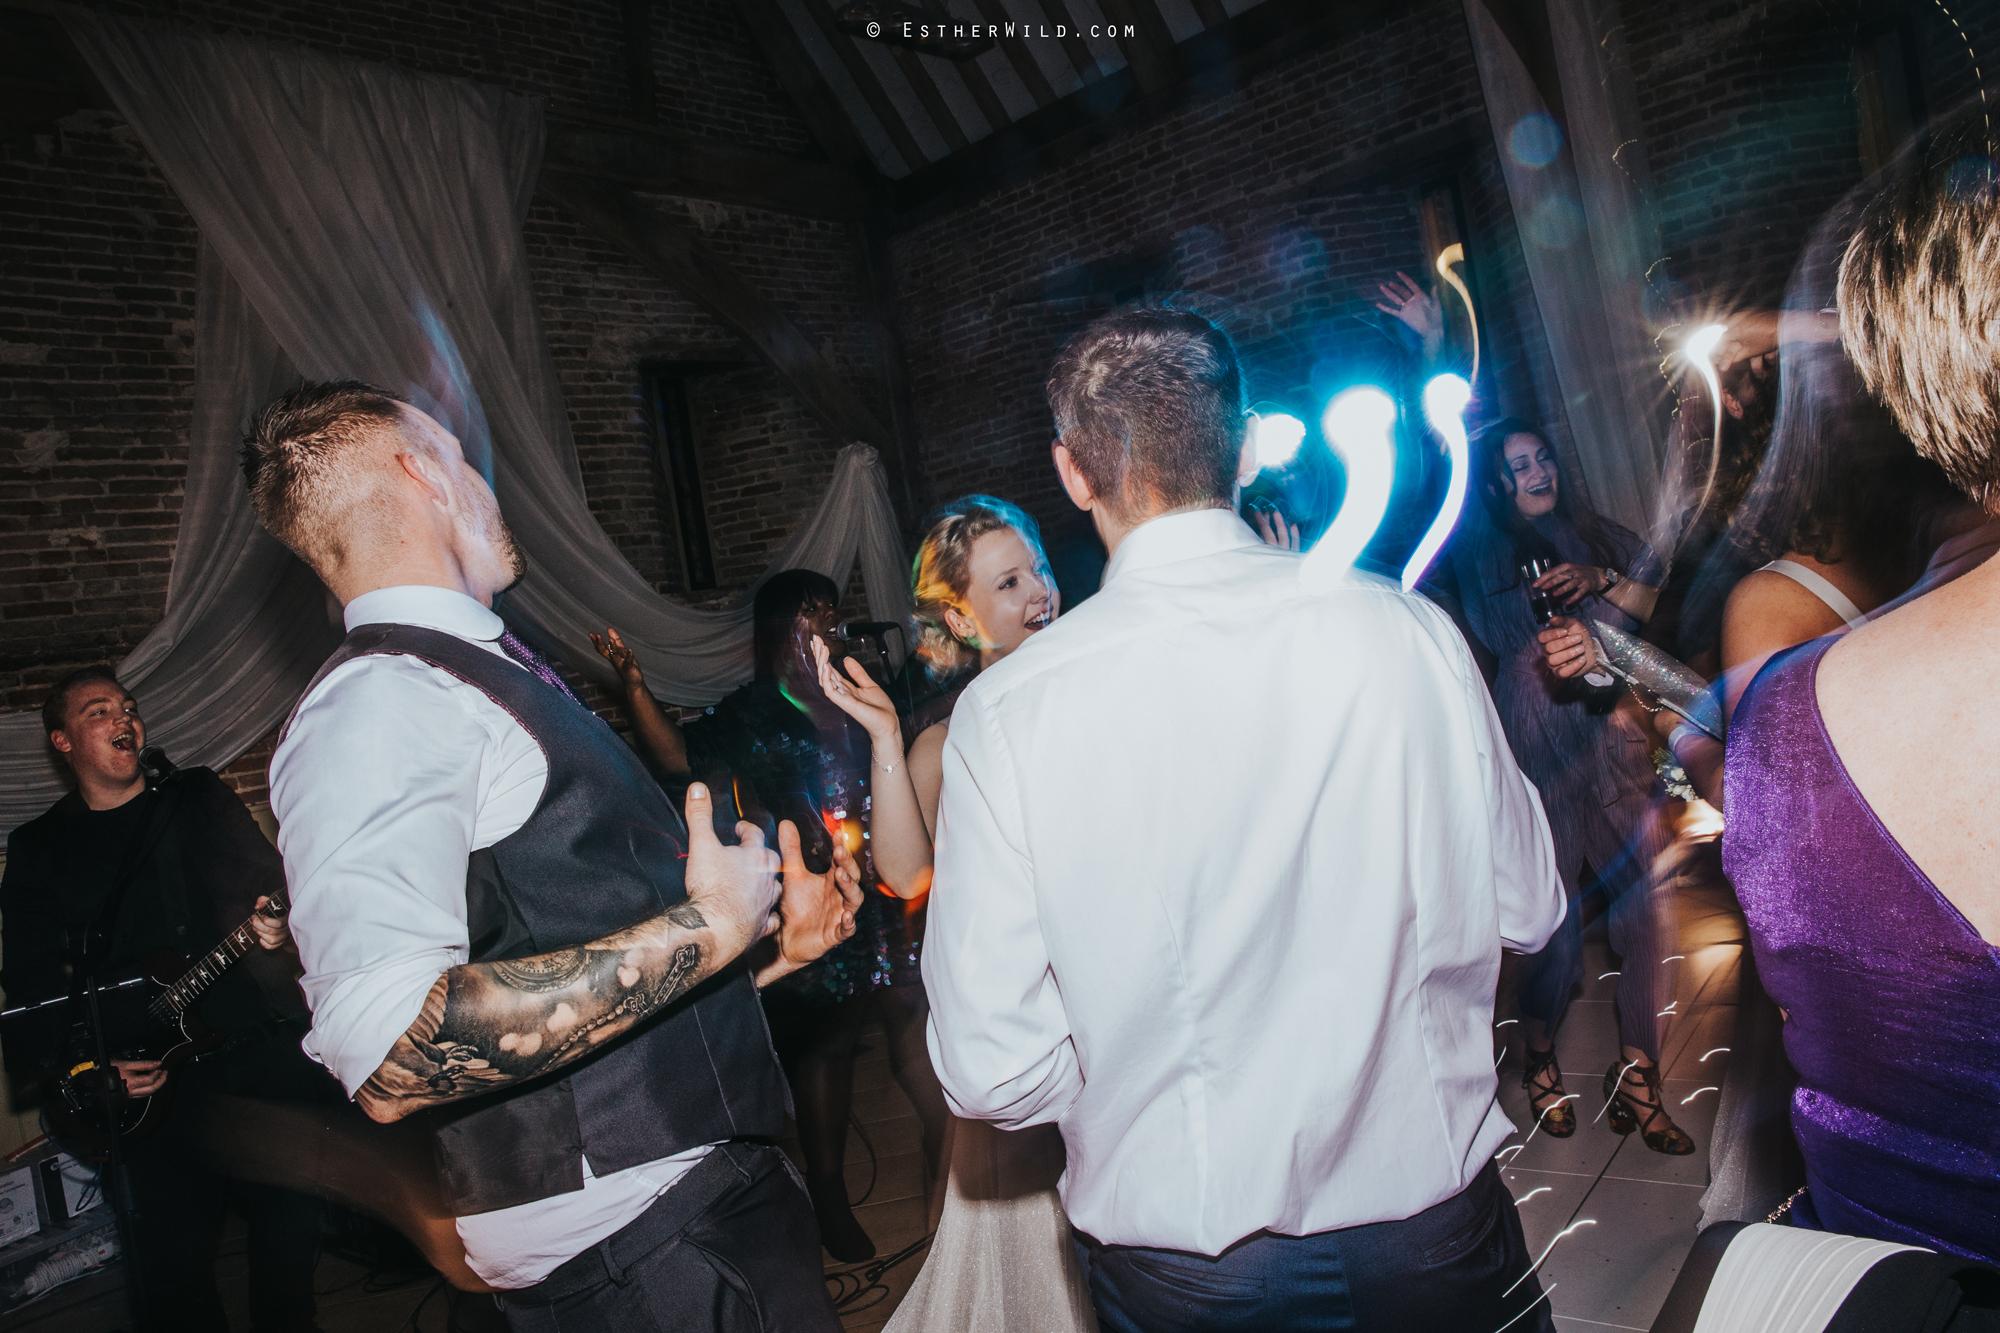 Elms_Barn_Weddings_Suffolk_Photographer_Copyright_Esther_Wild_IMG_3688.jpg